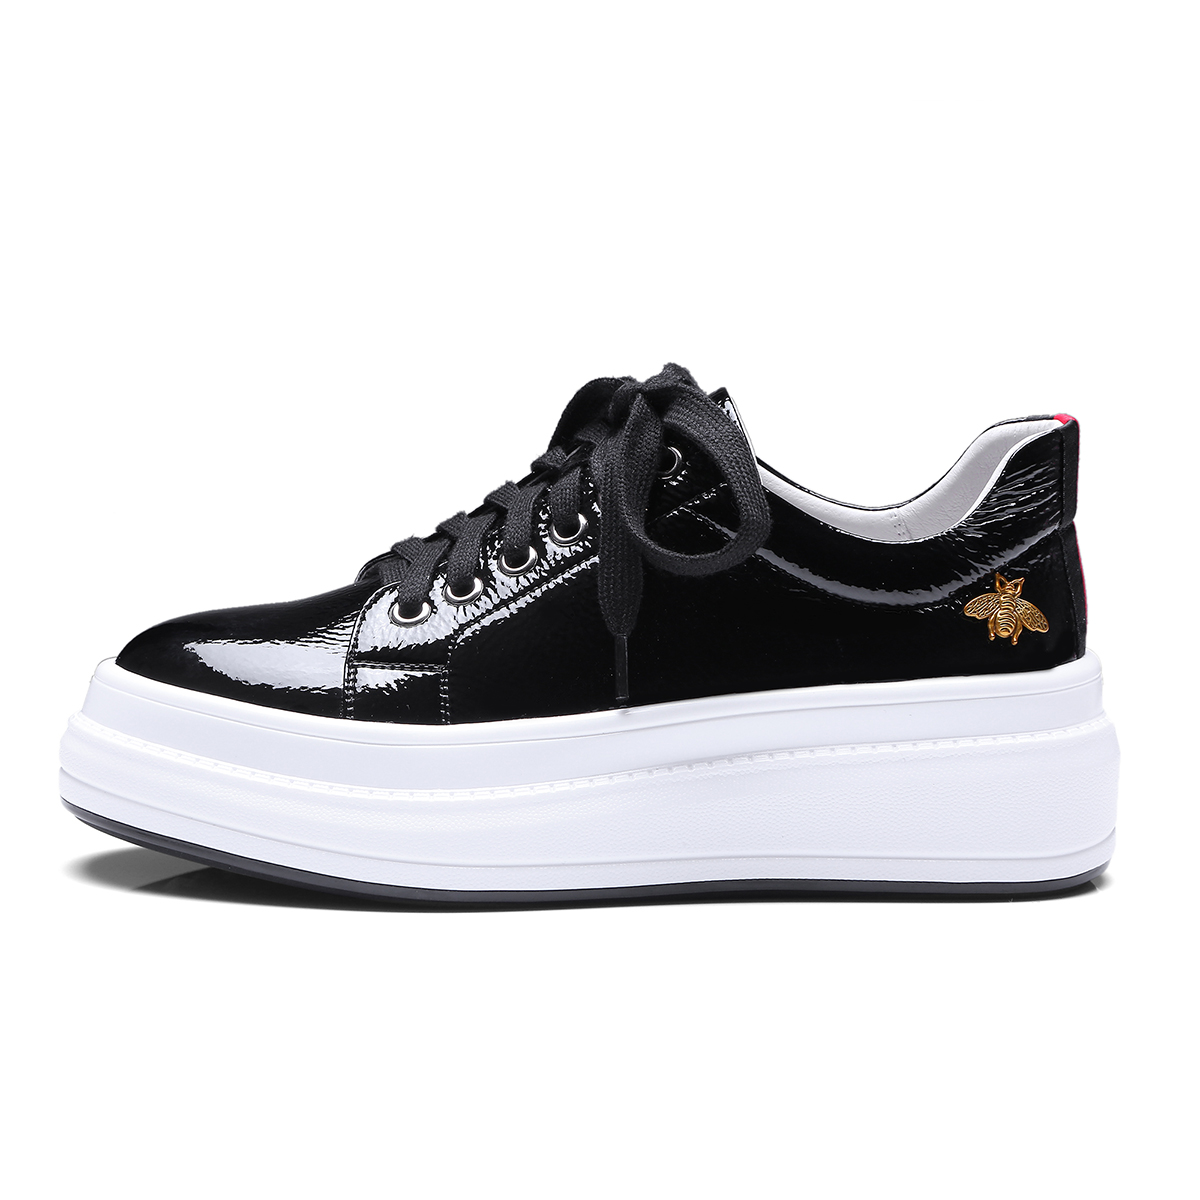 INDACO 2019 femmes baskets cuir blanc chaussures femme chaussures mode 34-40 - 5